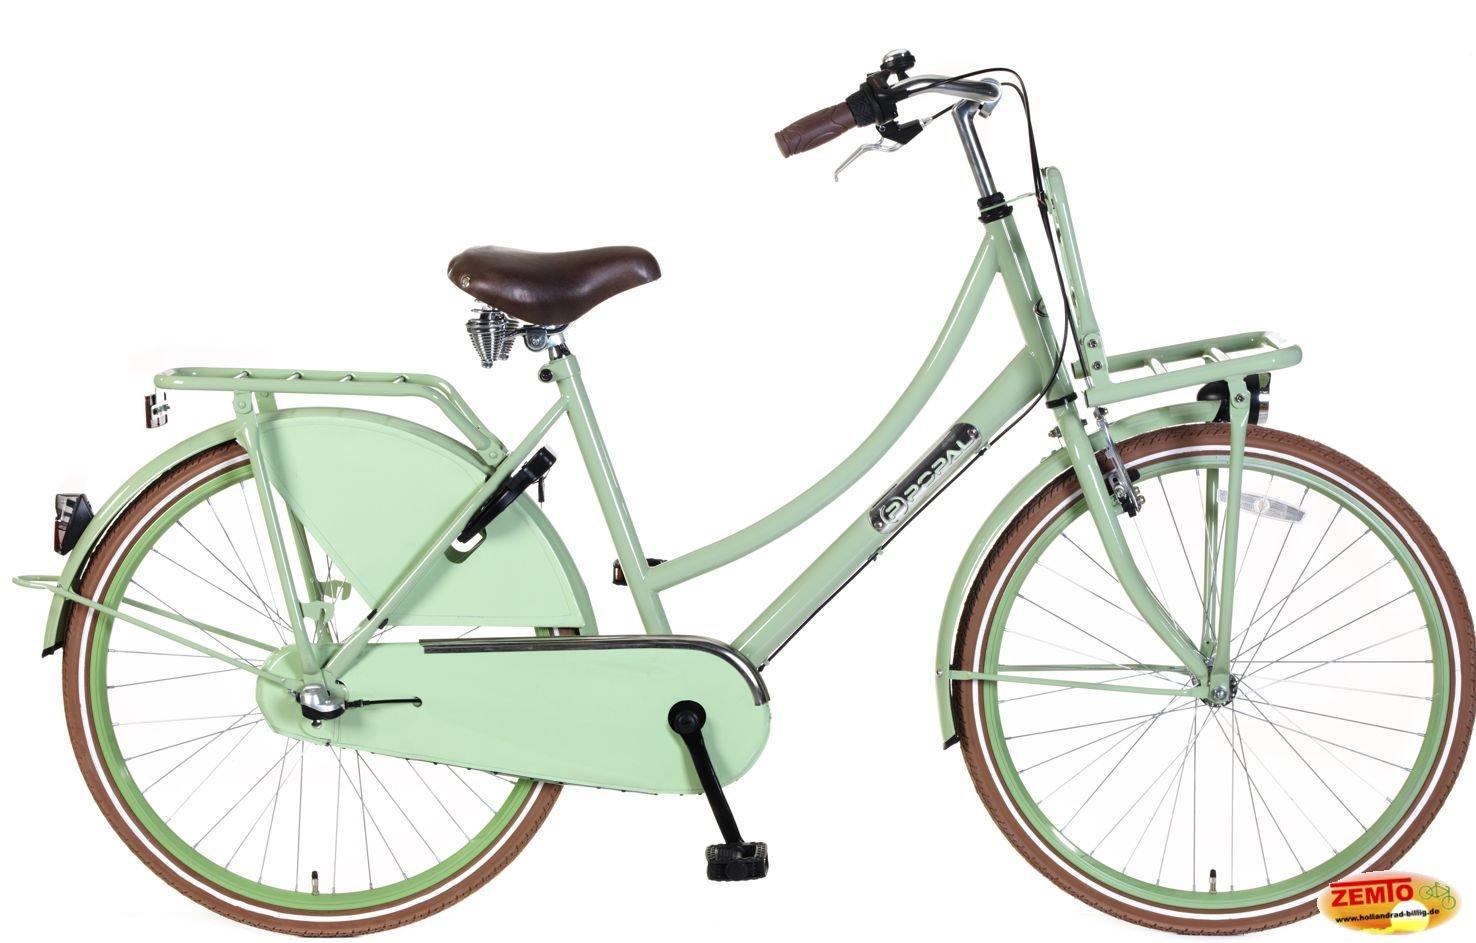 Bicicleta holandesa para mujer 26 pulgadas Plezier DDB pistacho 3 ...